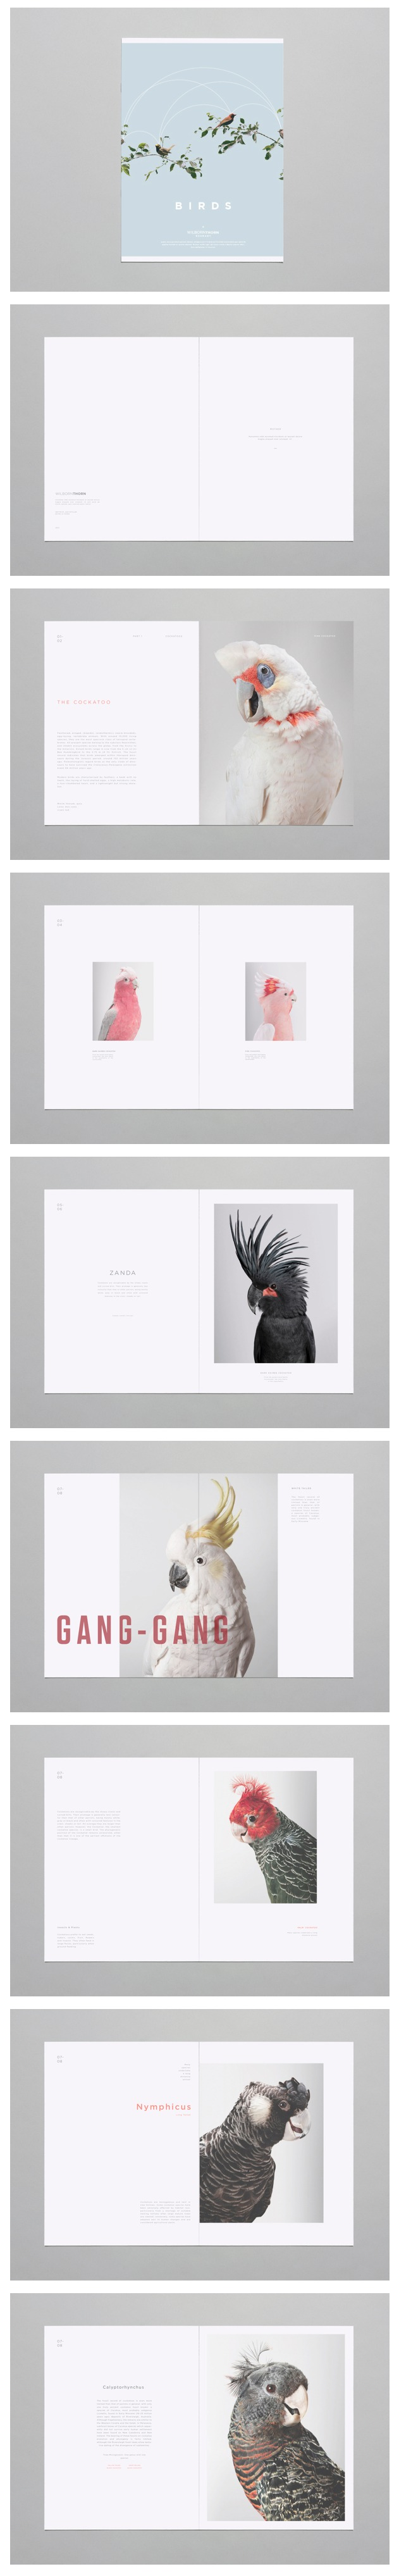 Brandon Nickerson - Birds